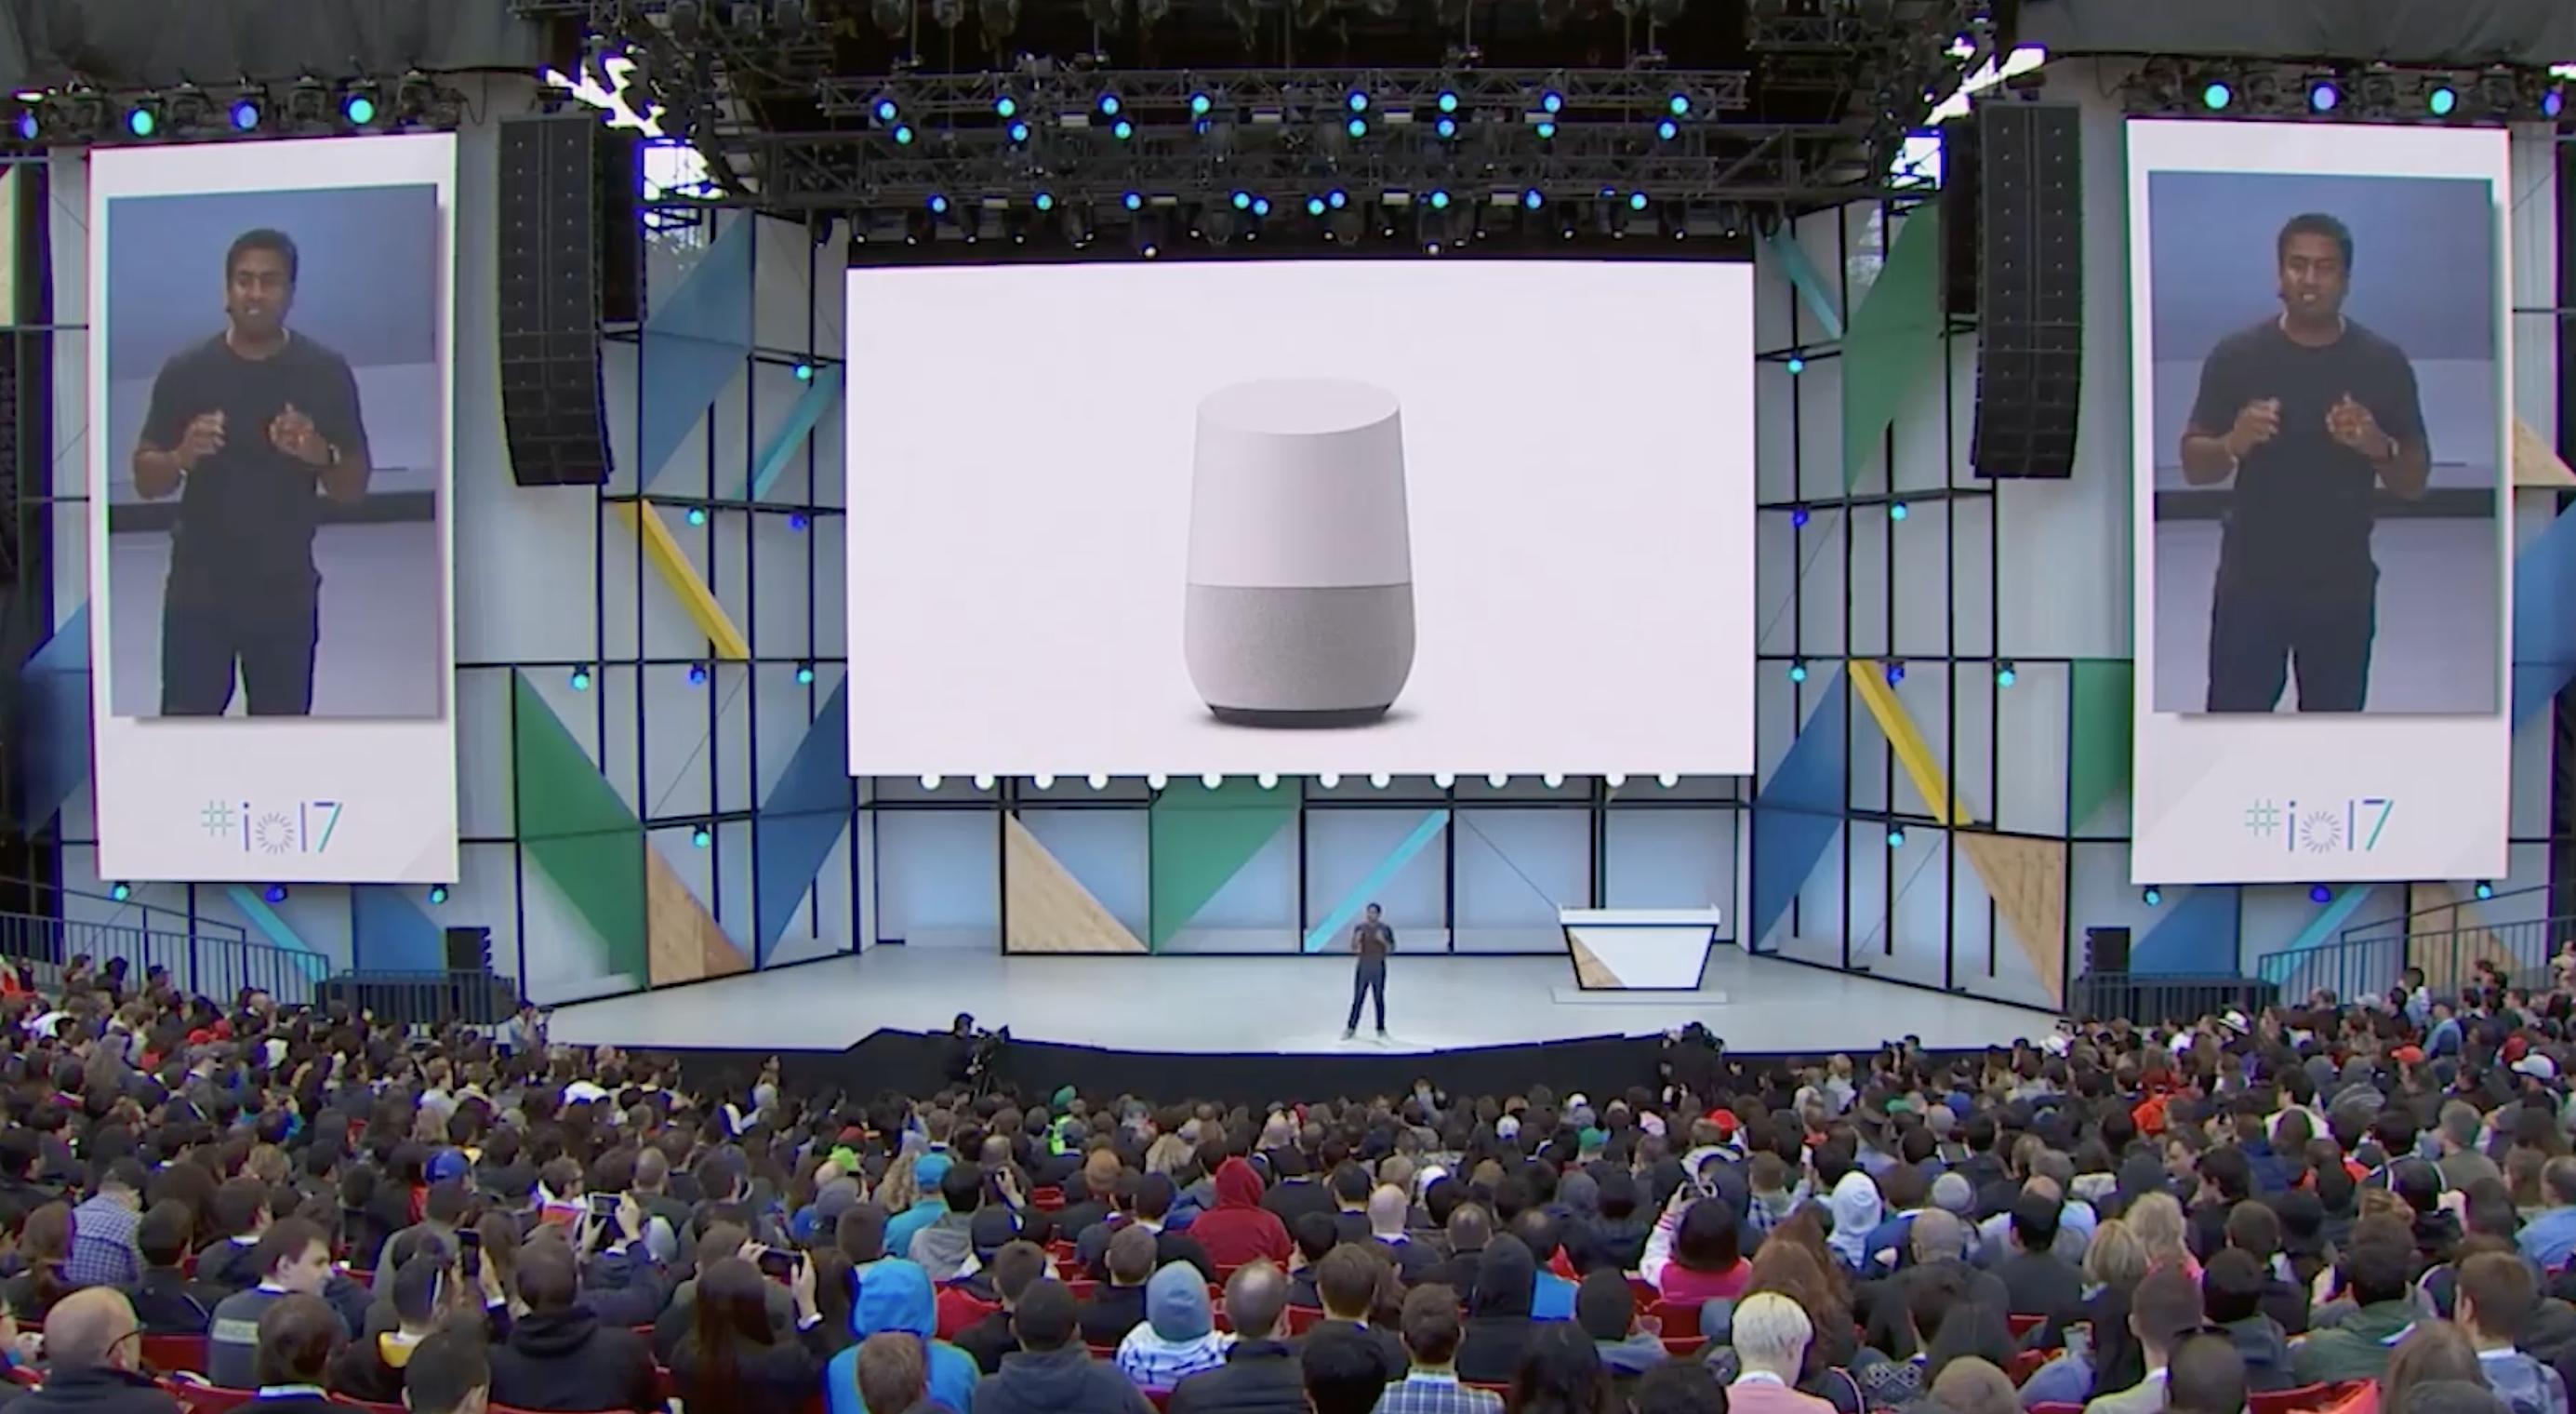 Google Home updates announced at Google I/O